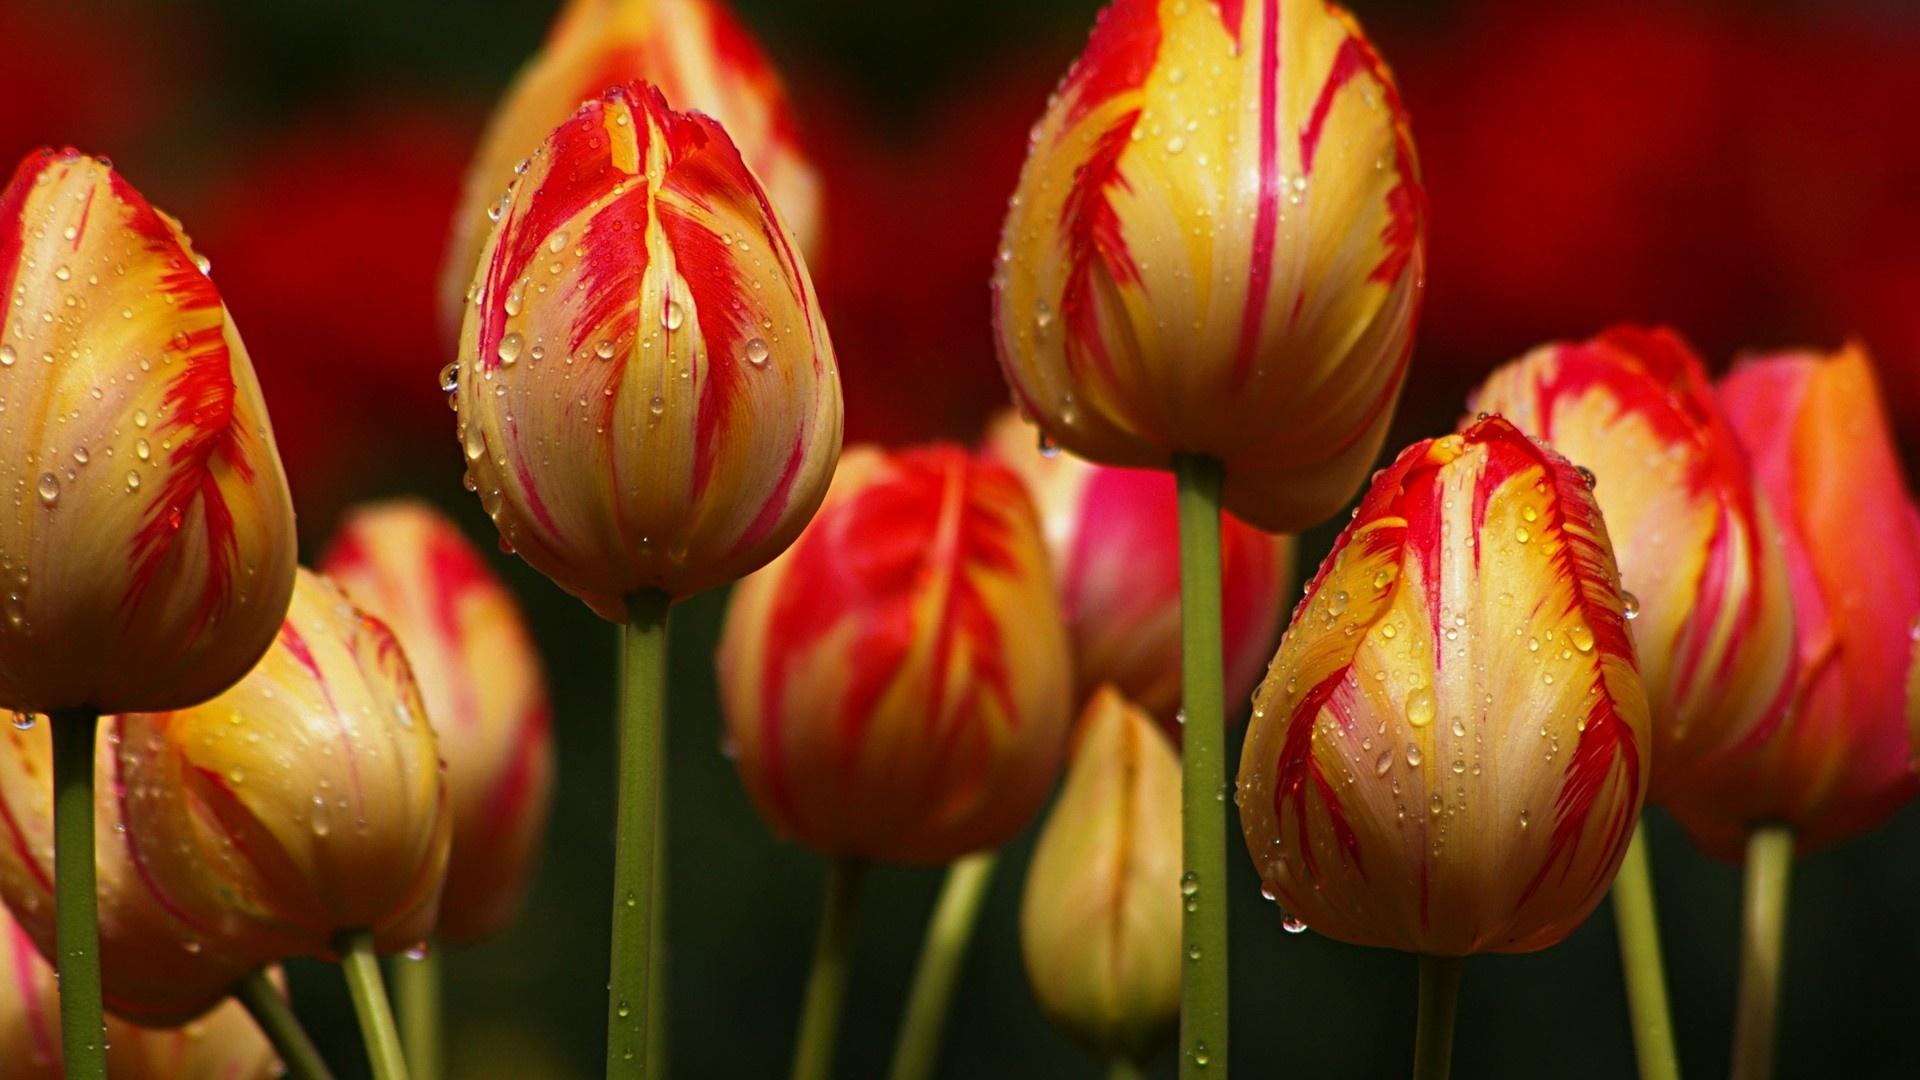 Fondos De Pantalla 1440x900 Tulipas Pascua Fondo De Color: Fondos De Pantalla Amarillo Con Rayas Rojas Flores De Los